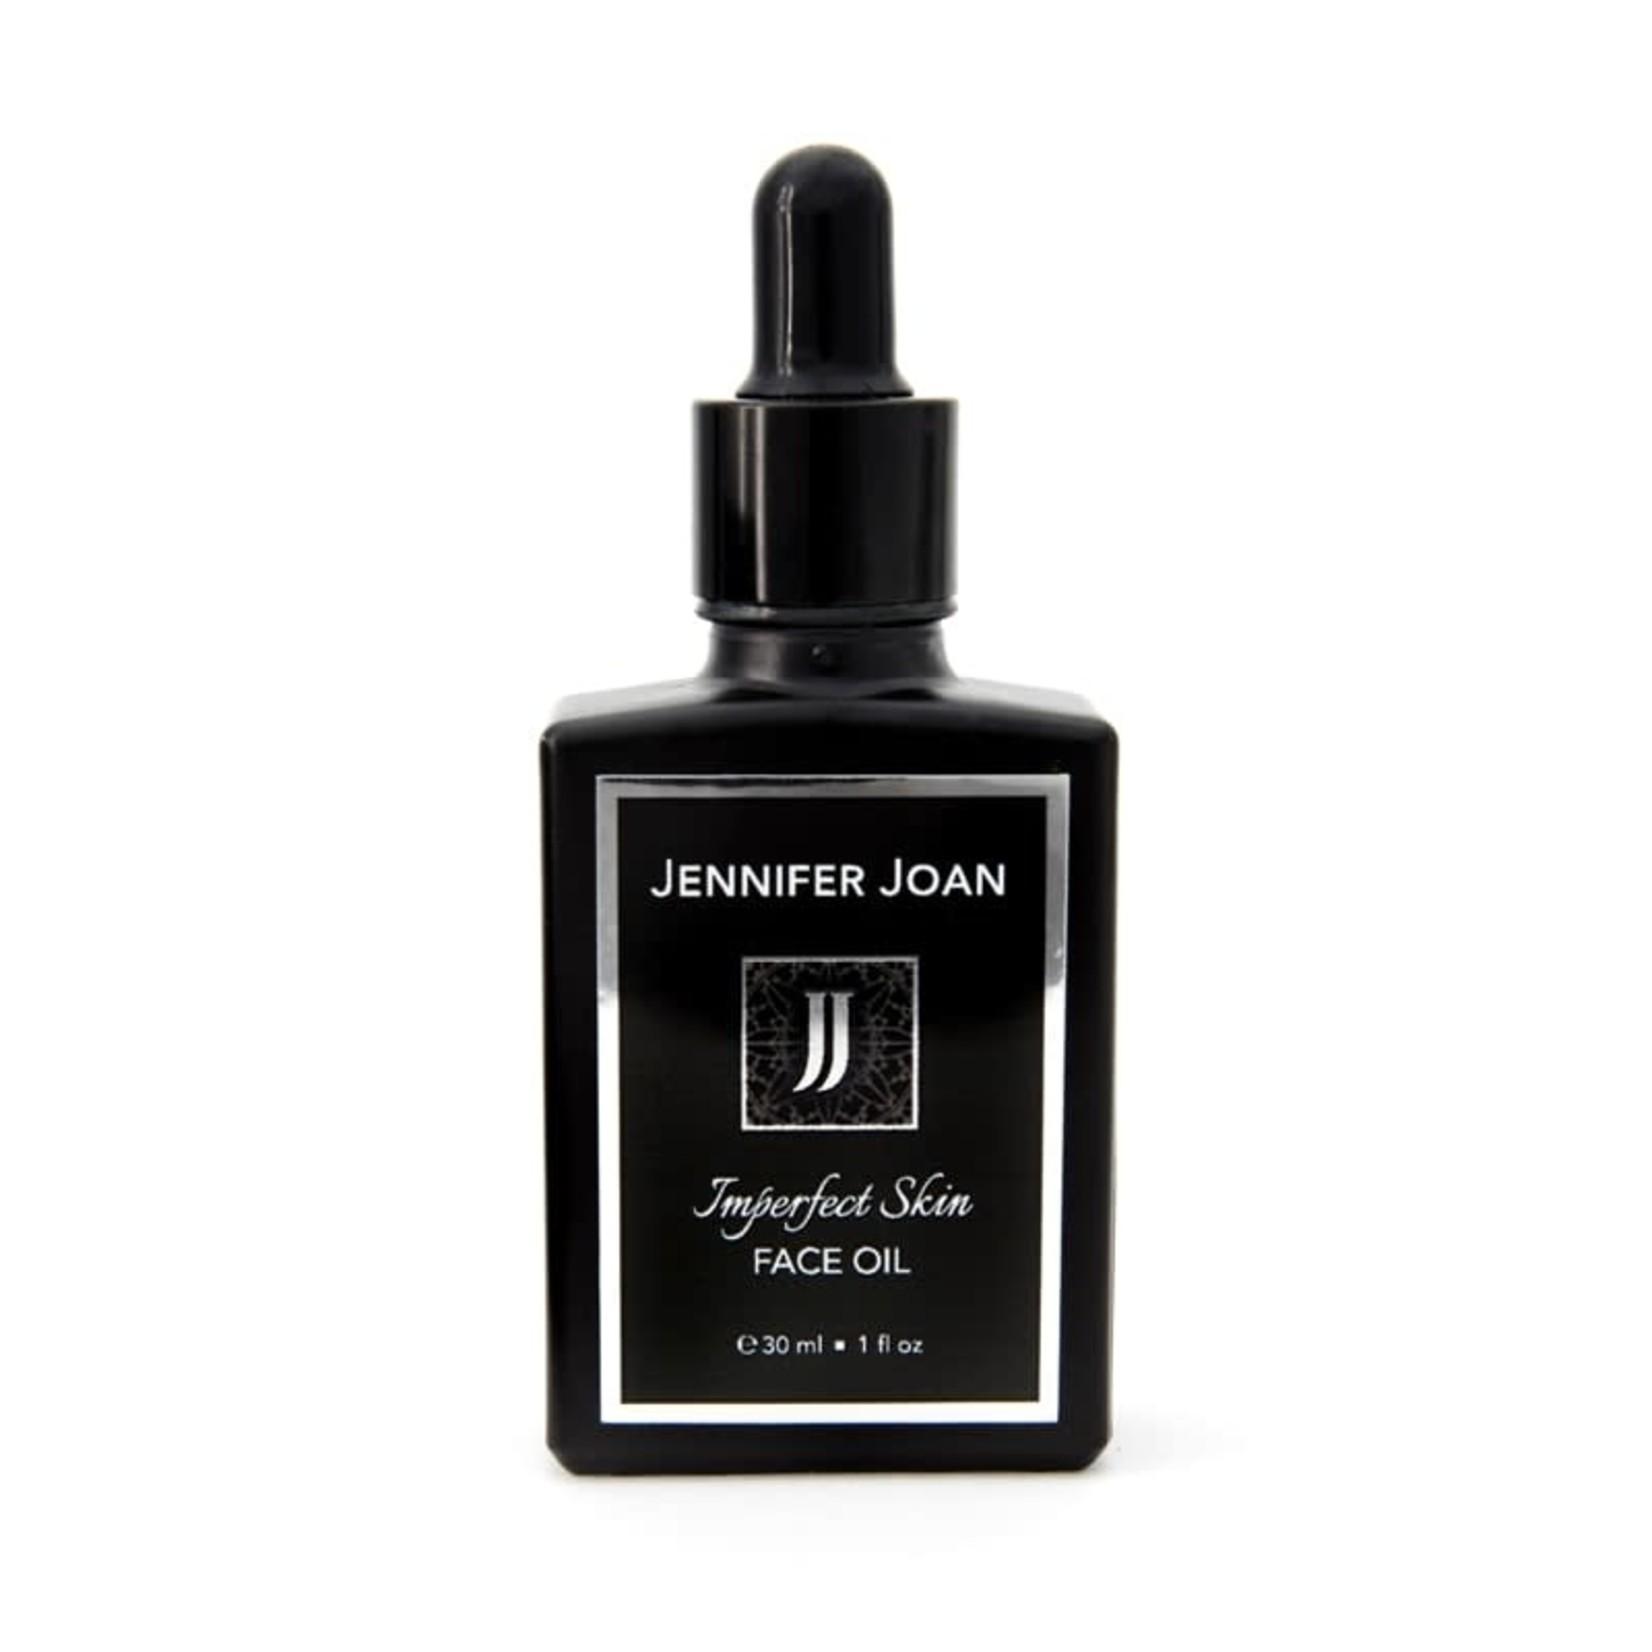 JENNIFER JOAN FACE OIL - IMPERFECT SKIN